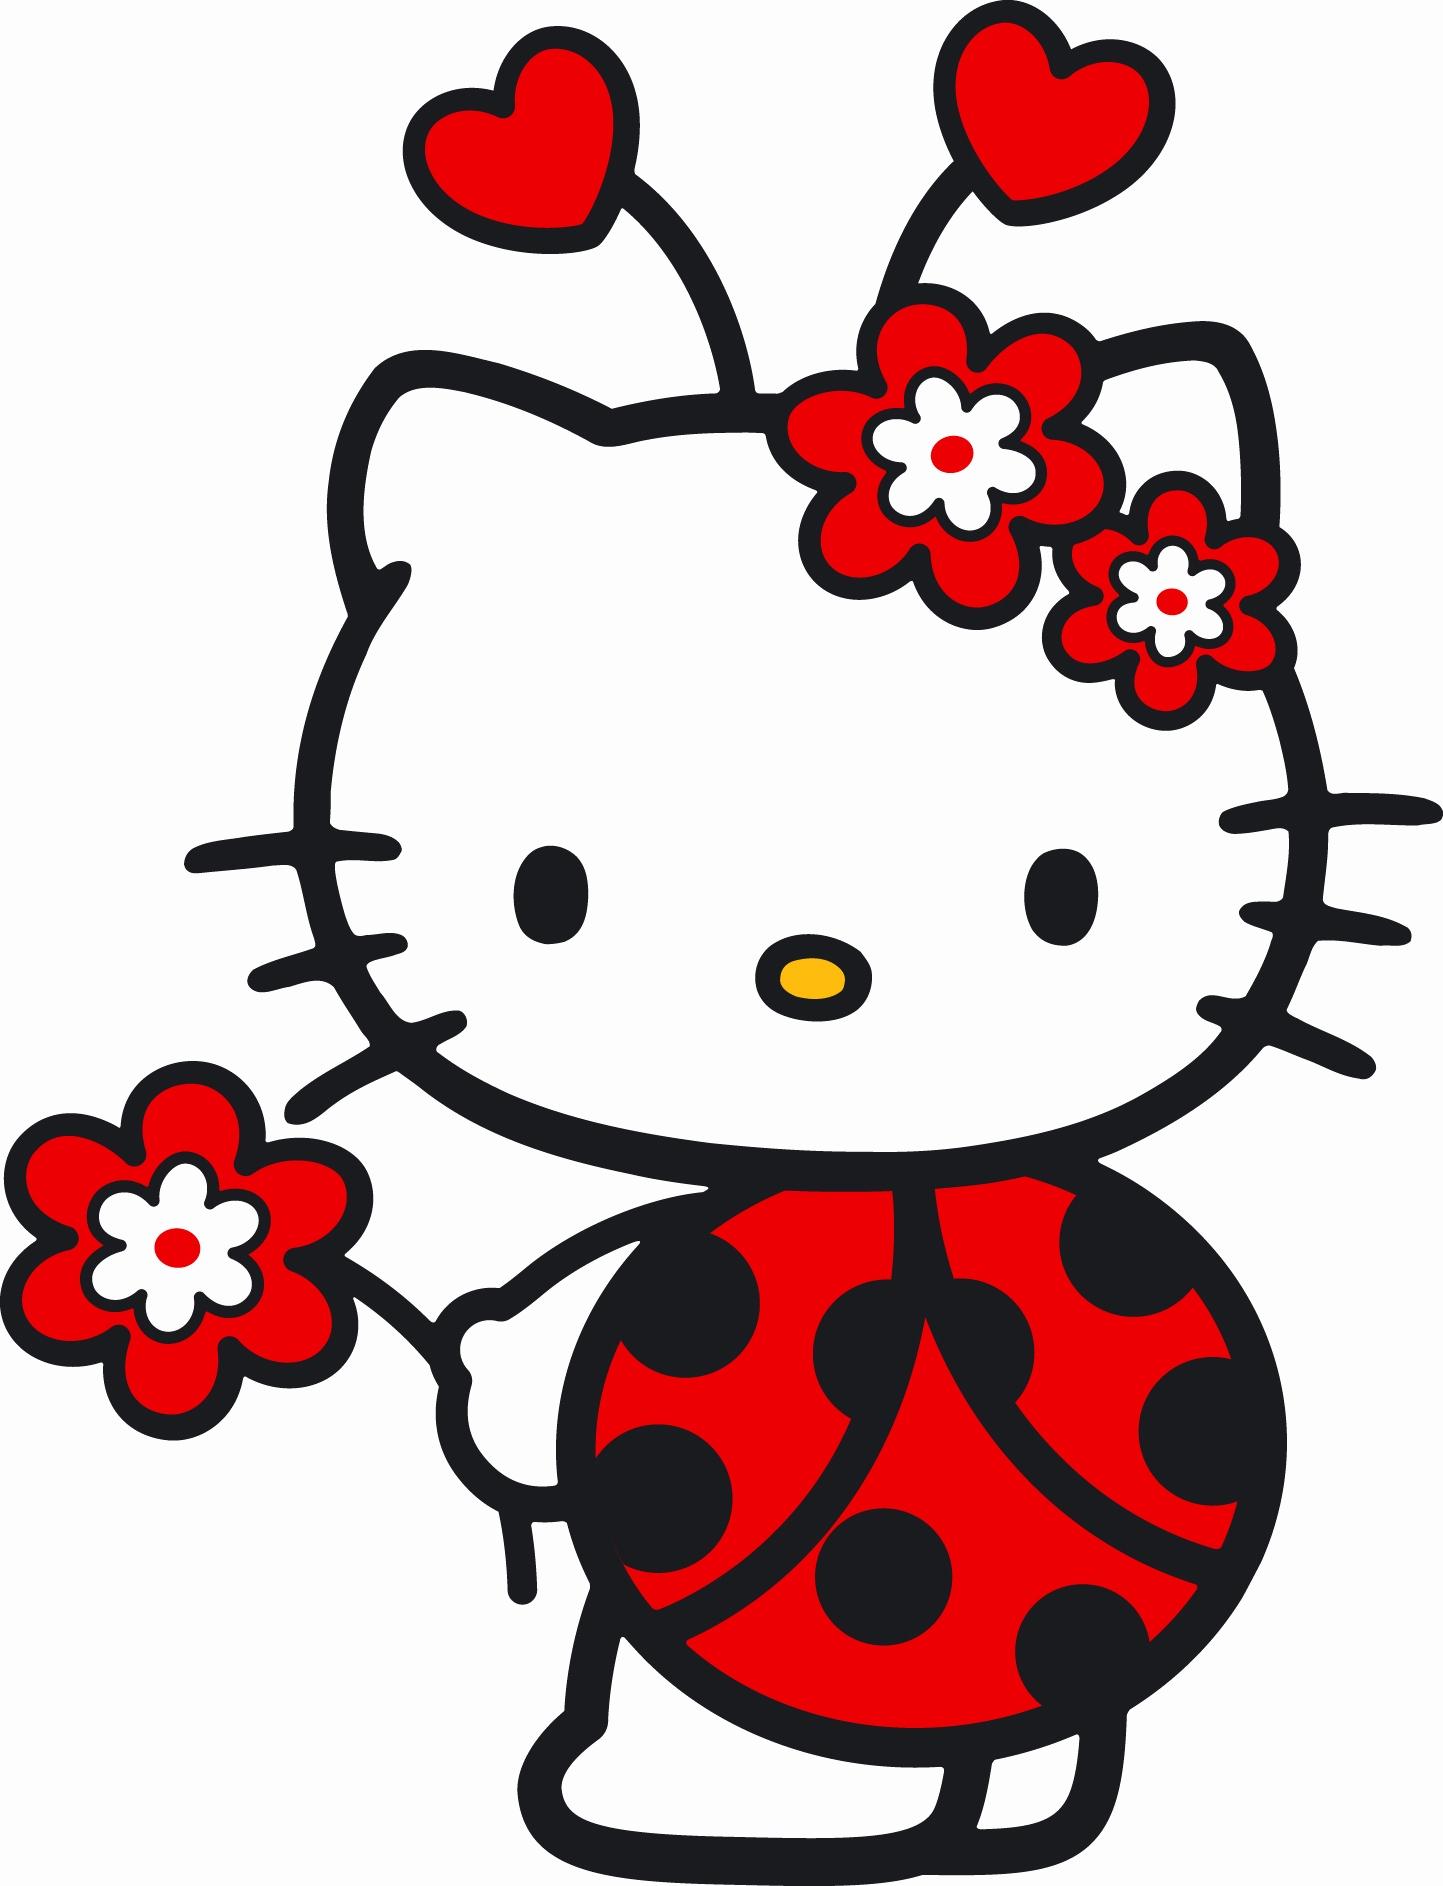 1443x1886 Cute Ladybug Clipart Luxury Line Art Of Cute Ladybug With Hearts